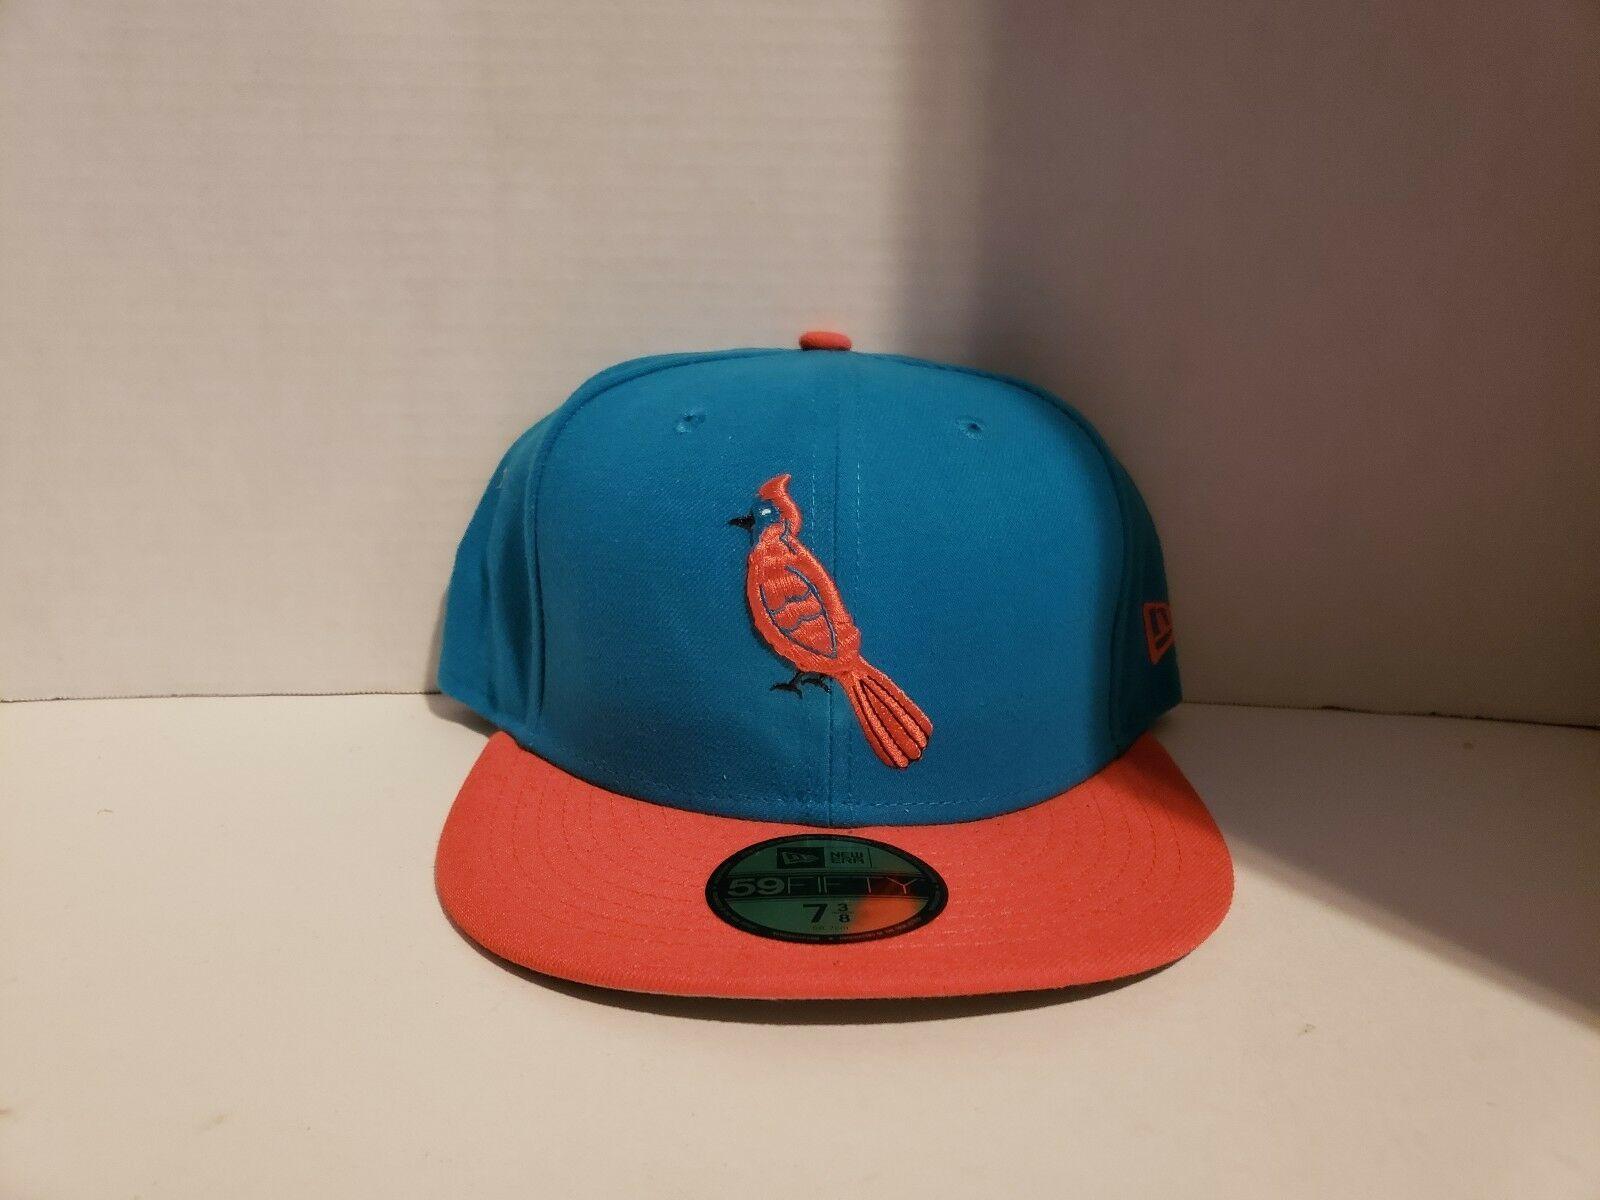 New Era St Louis Cardinals Custom Kobe and similar items 1600x1200